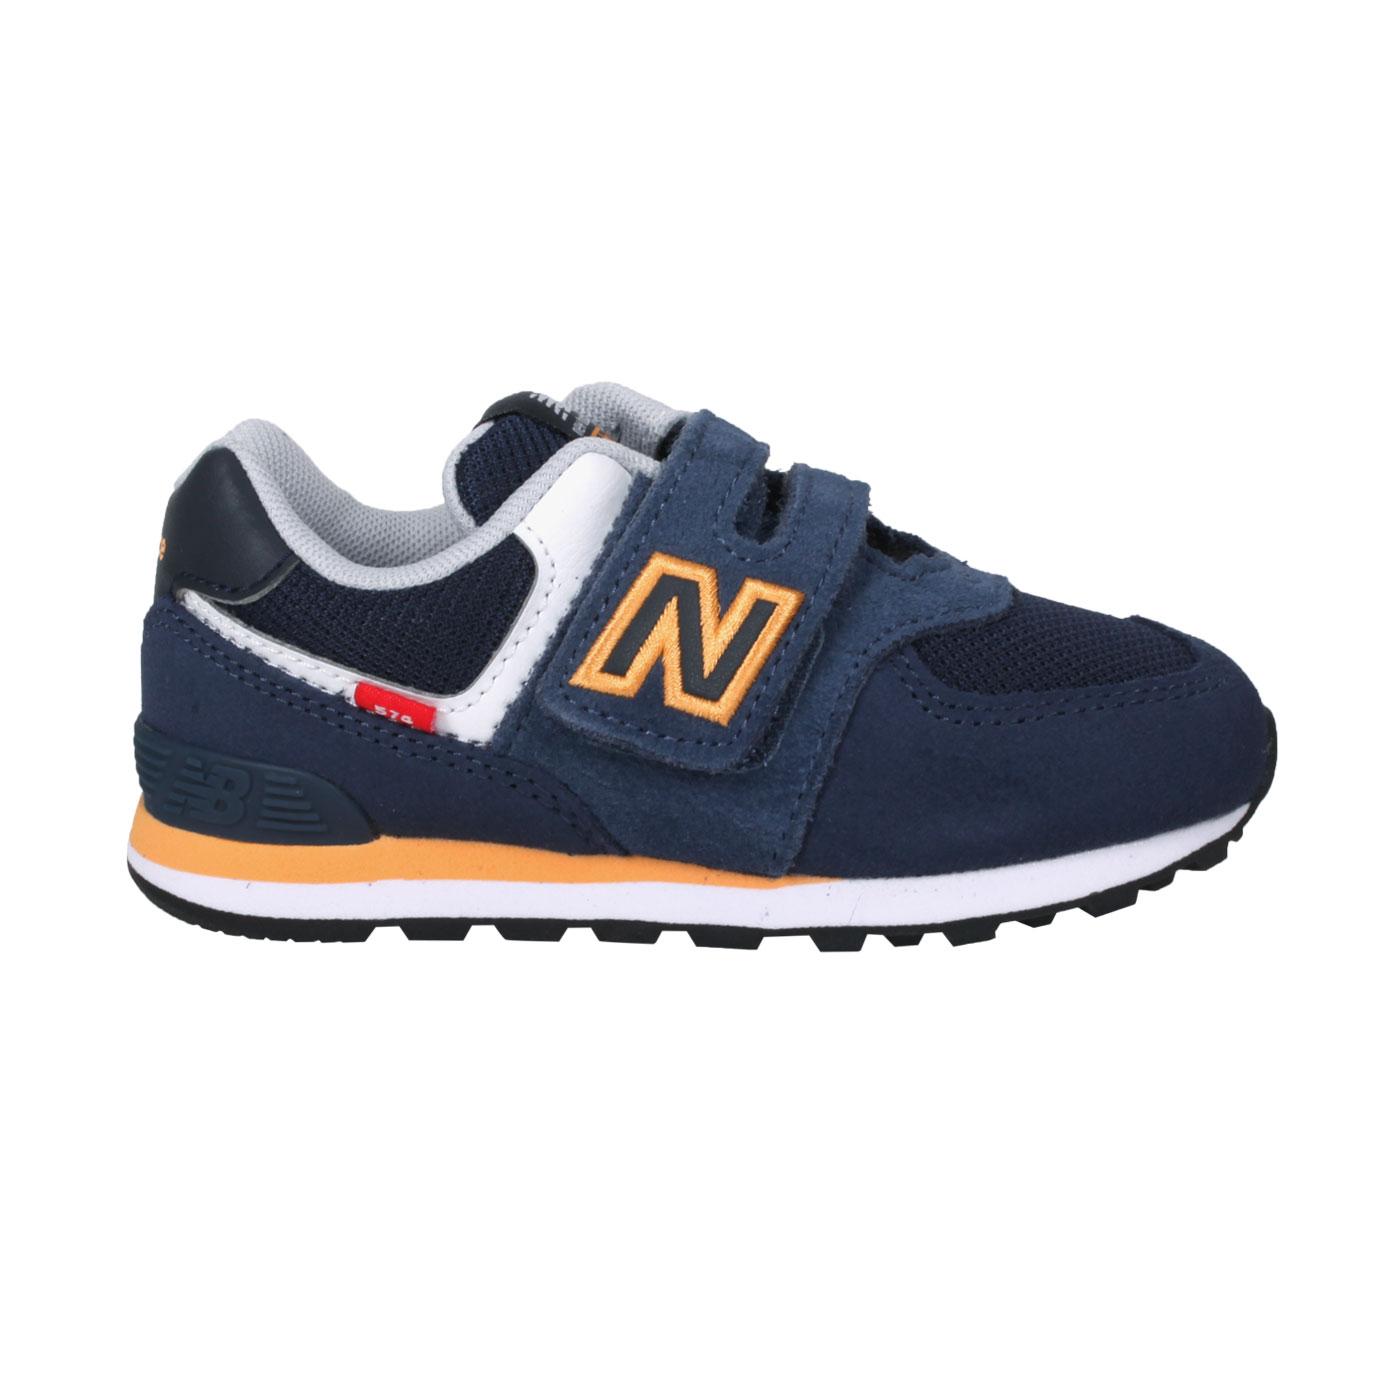 NEW BALANCE 小童休閒運動鞋-WIDE IV574SY2